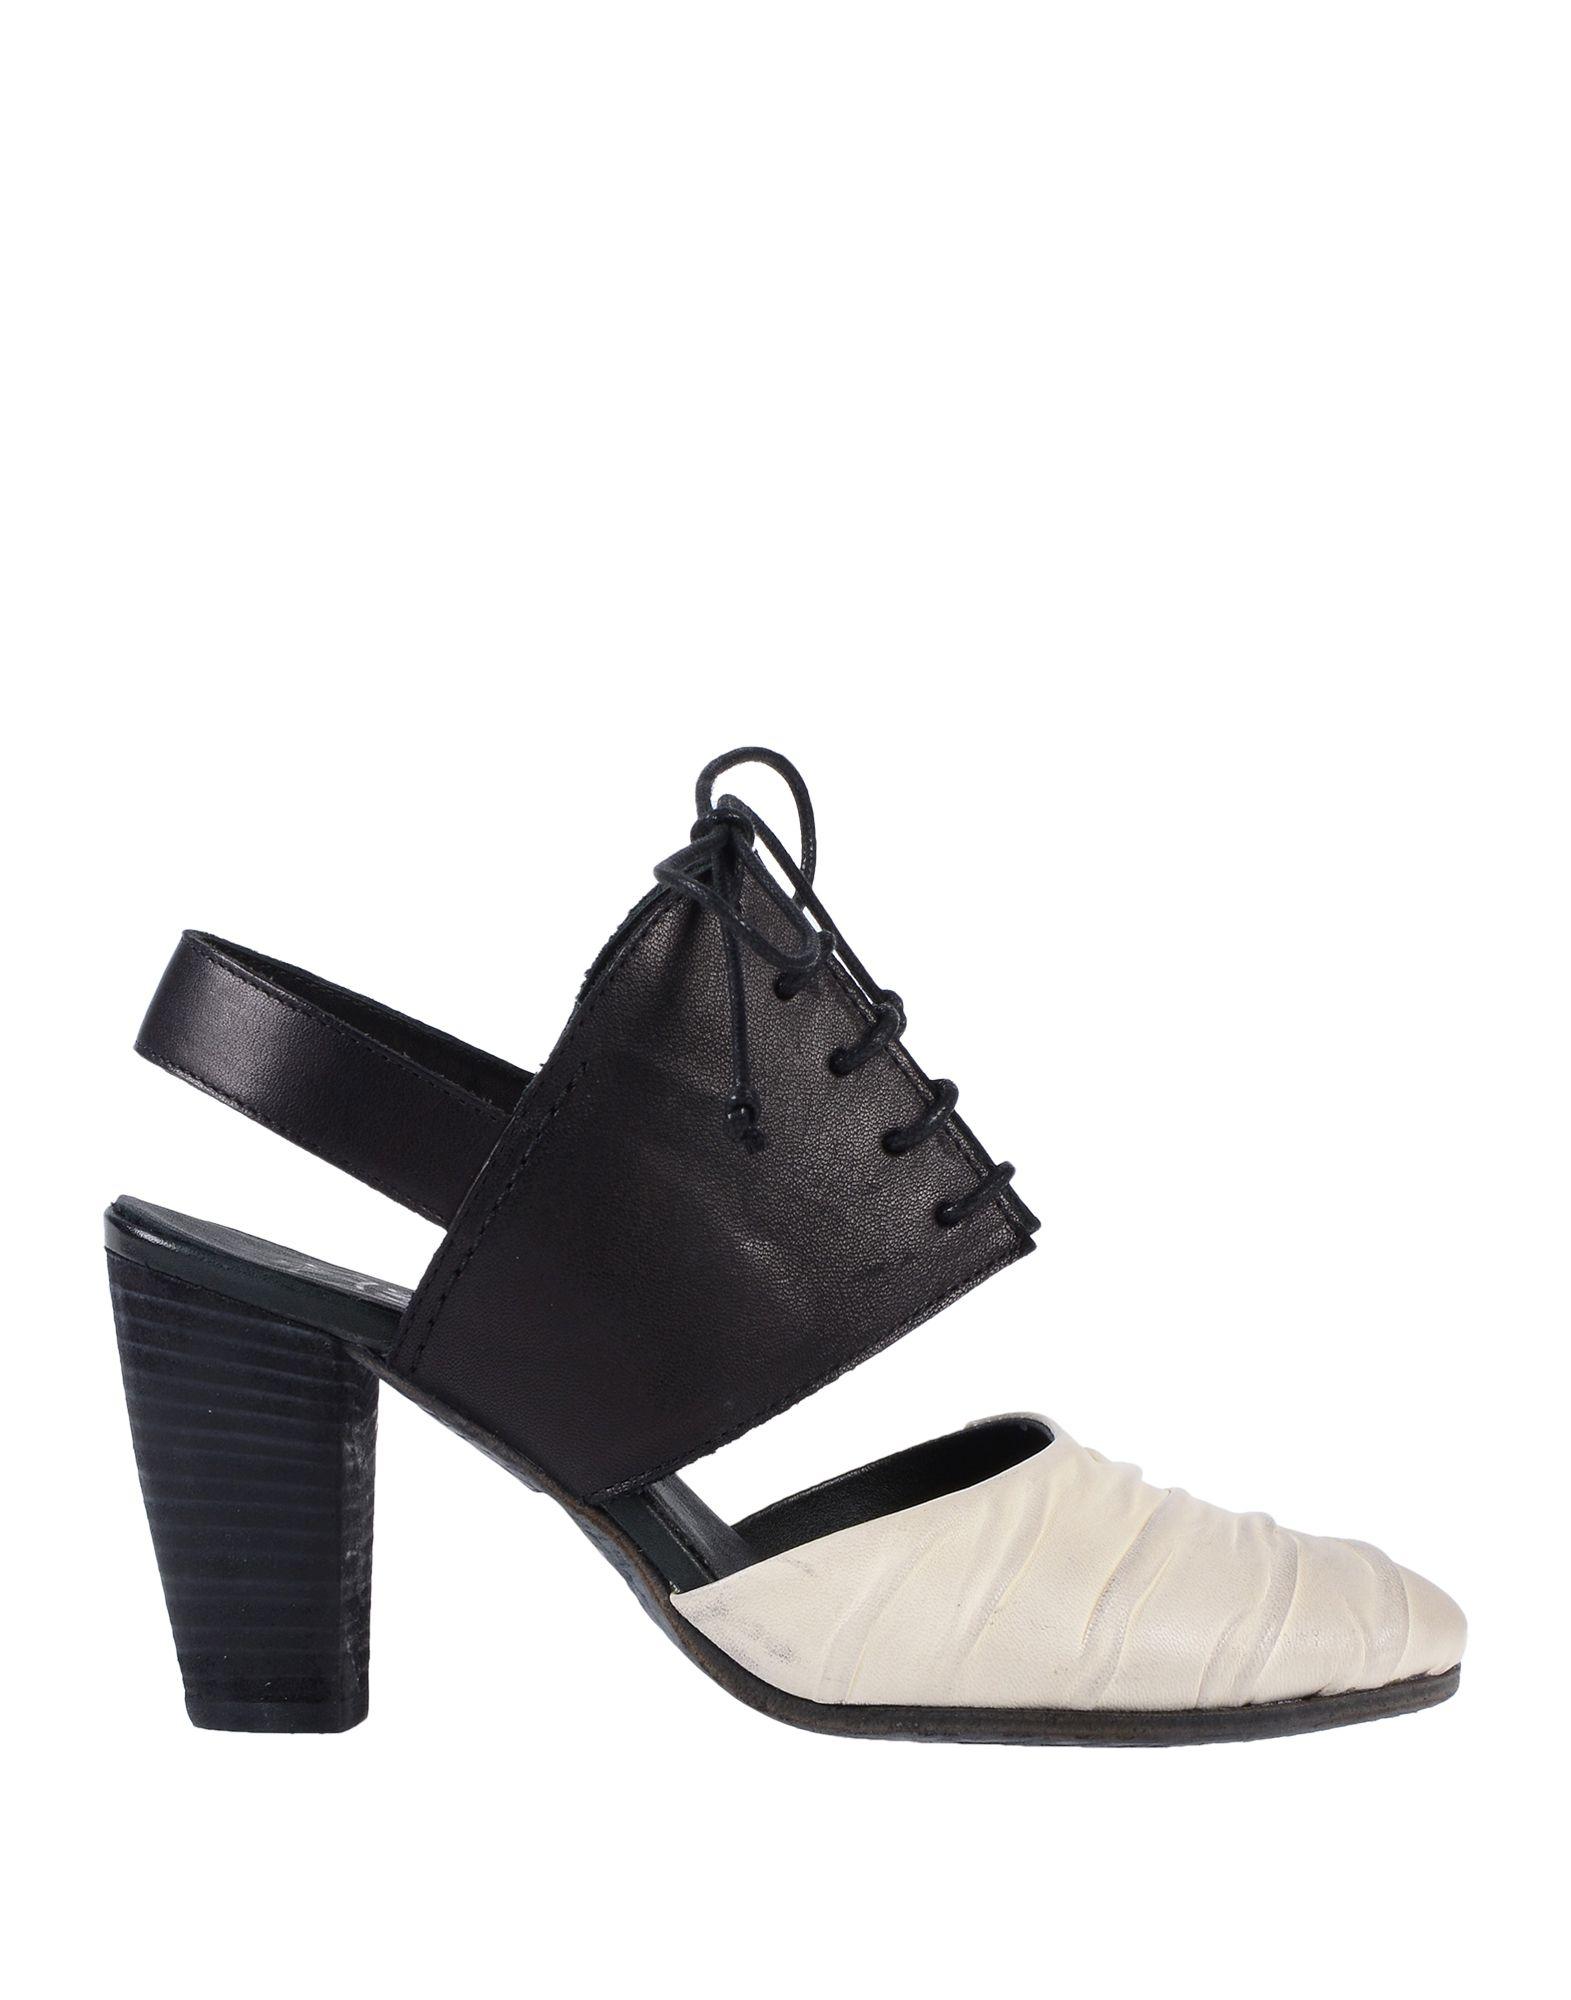 KING by SOFIA TARTUFOLI Обувь на шнурках